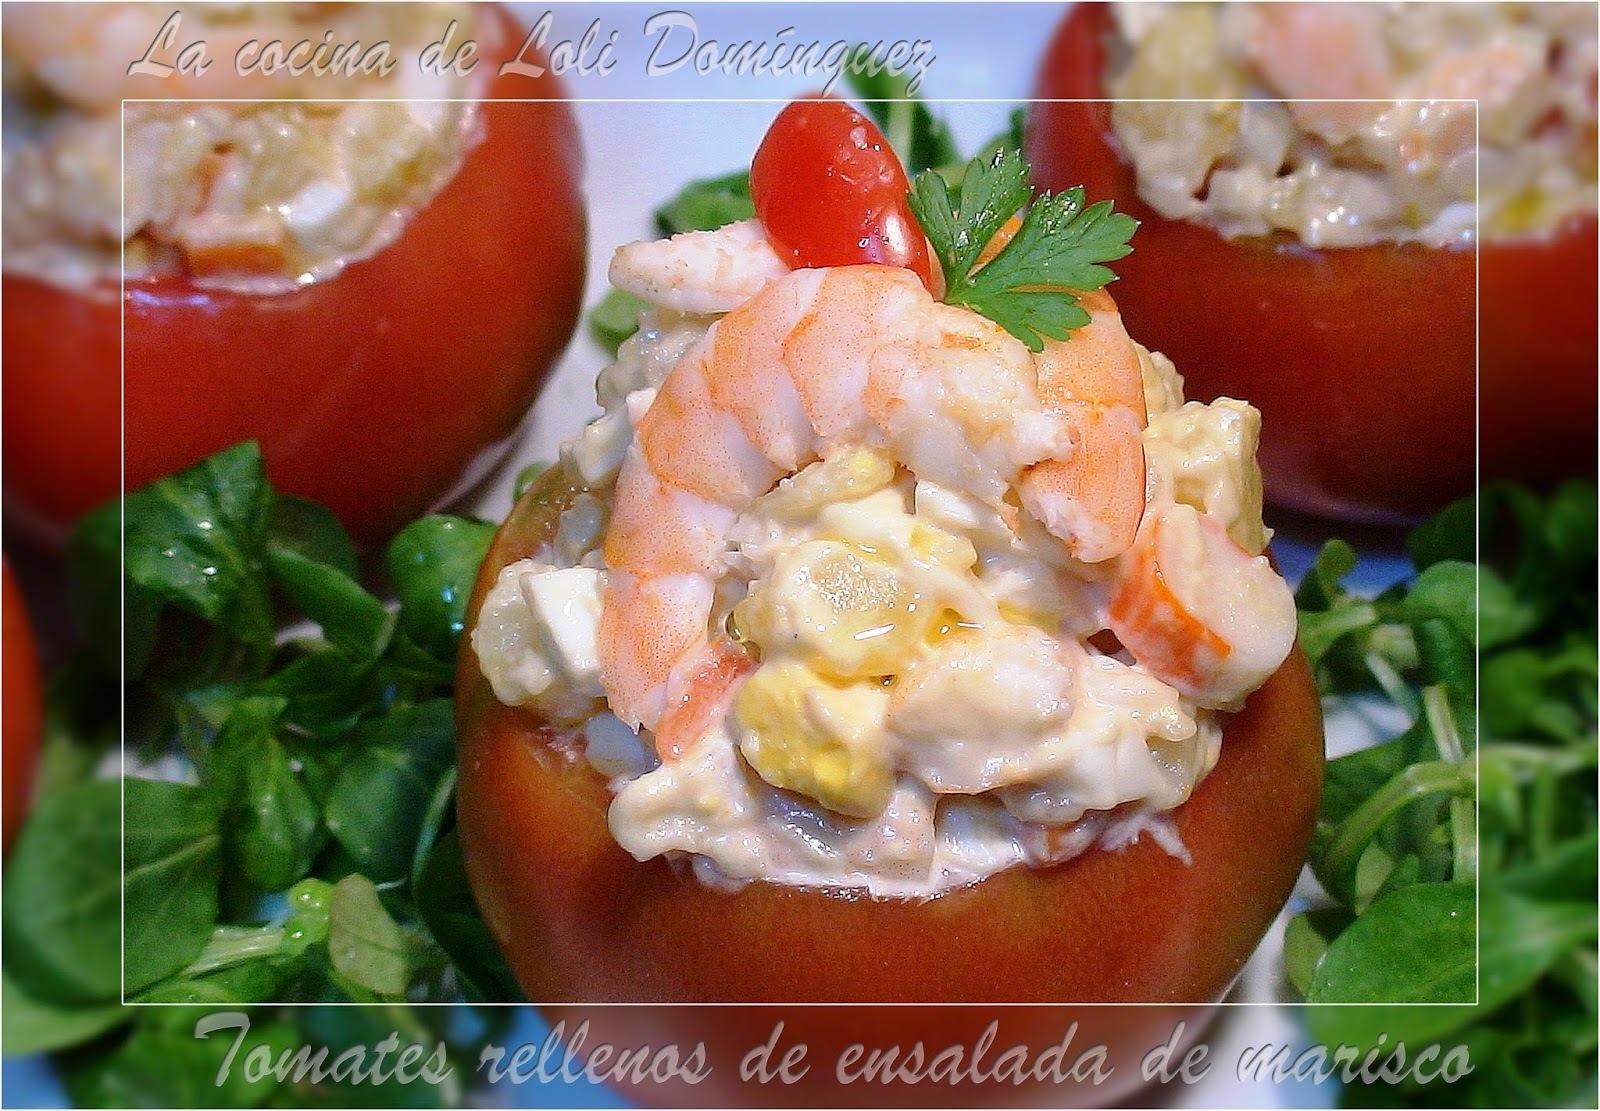 Tomates rellenos de ensalada de marisco